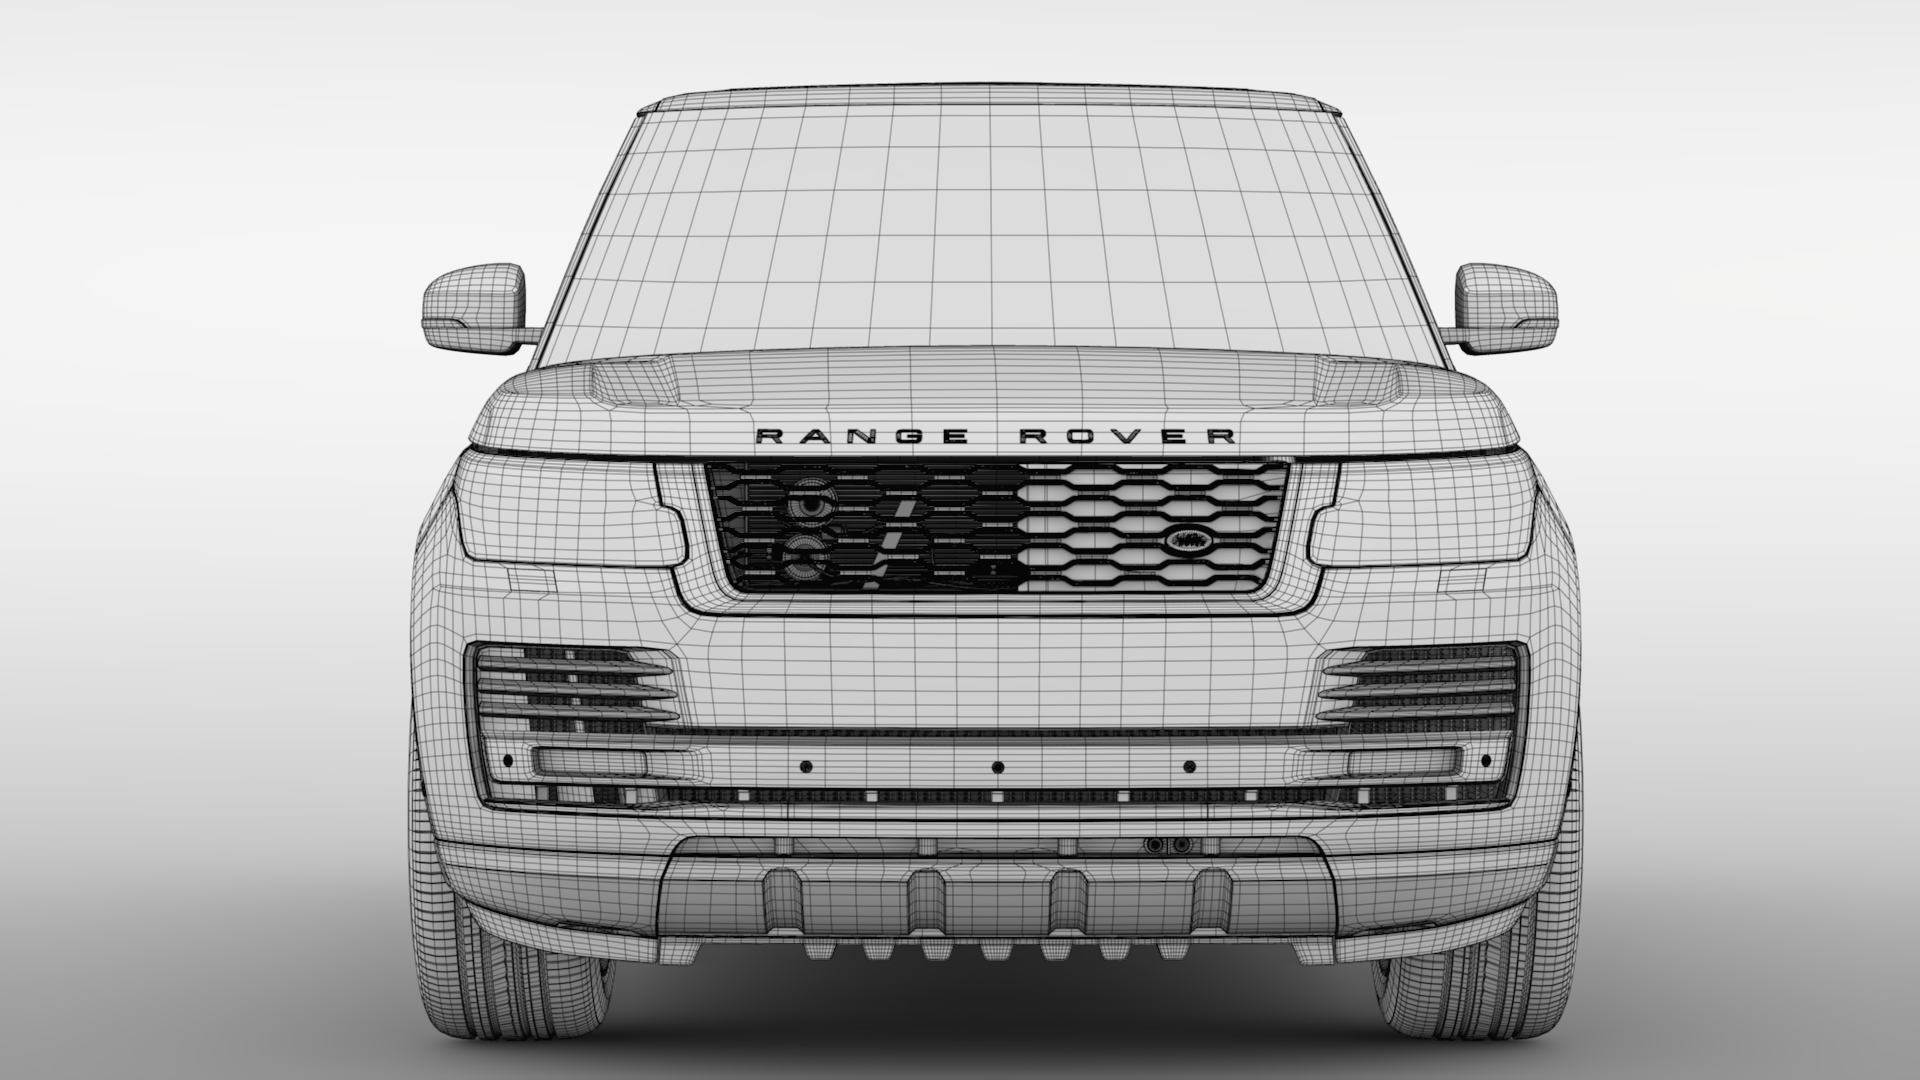 range rover autobiography p400e lwb l405 2018 3d model fbx c4d lwo ma mb hrc xsi obj 277373